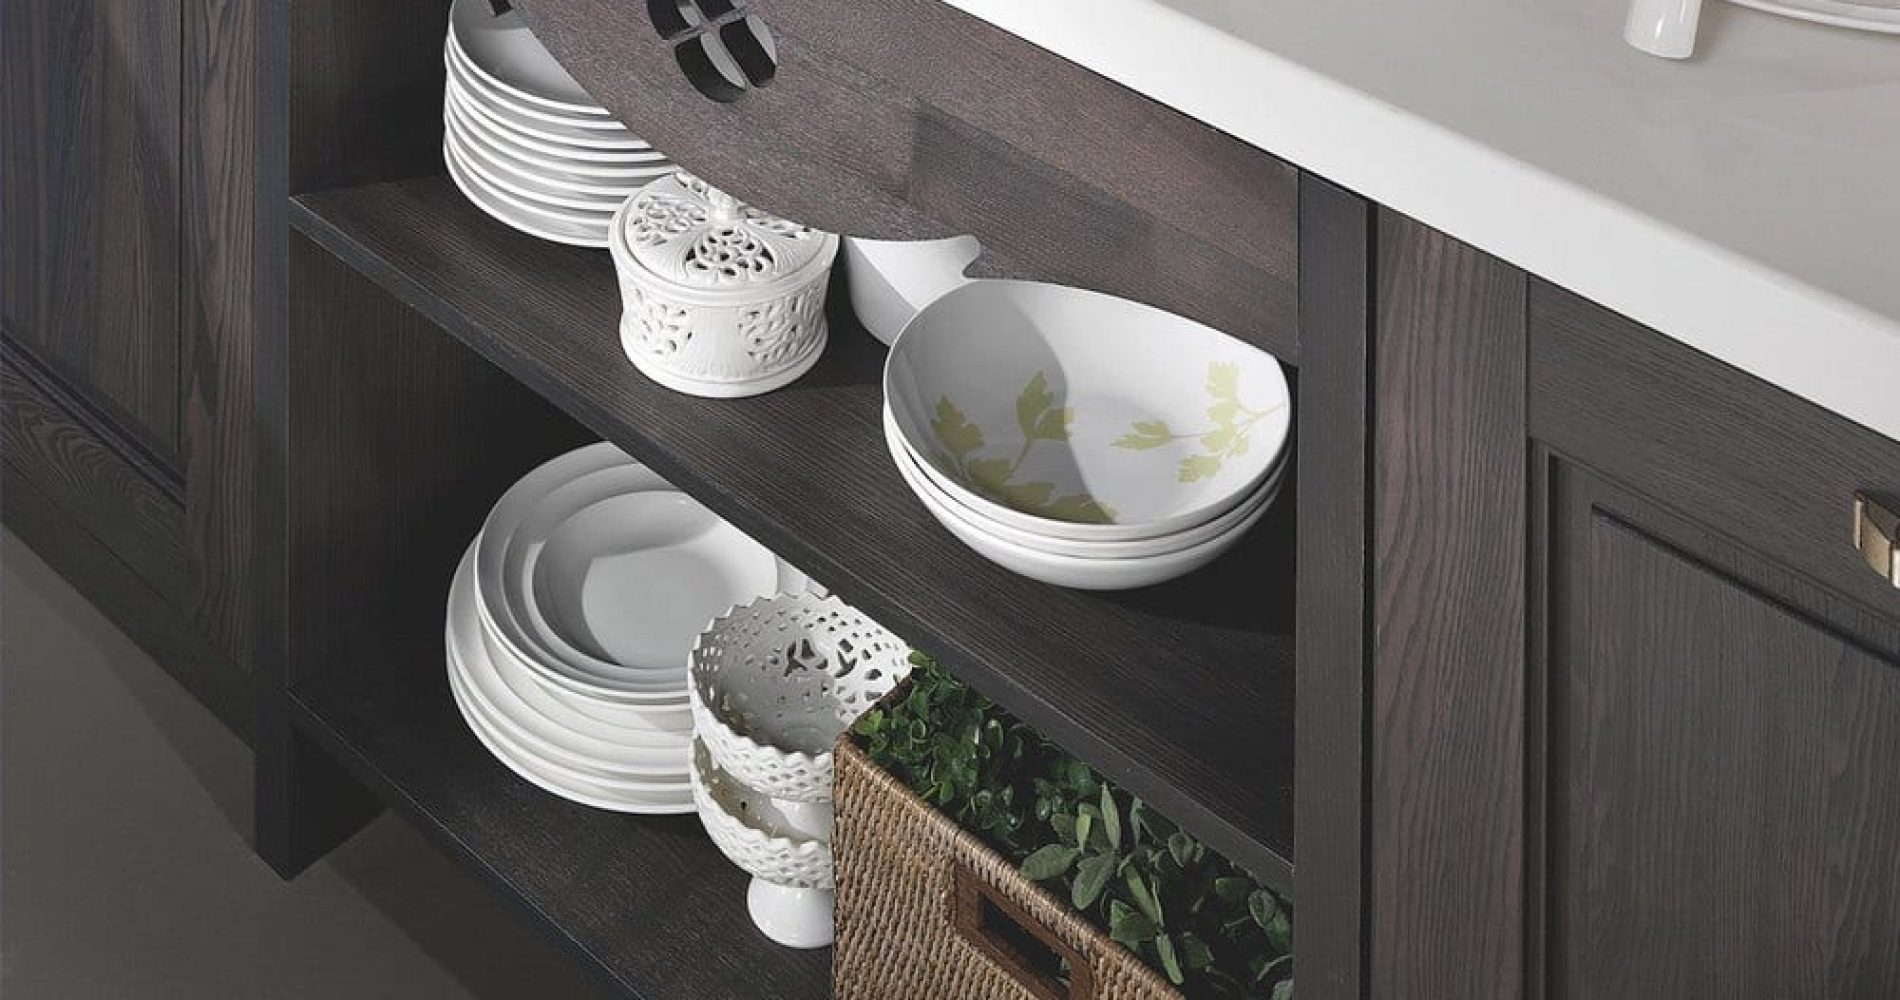 002-classic-kitchen-aisha